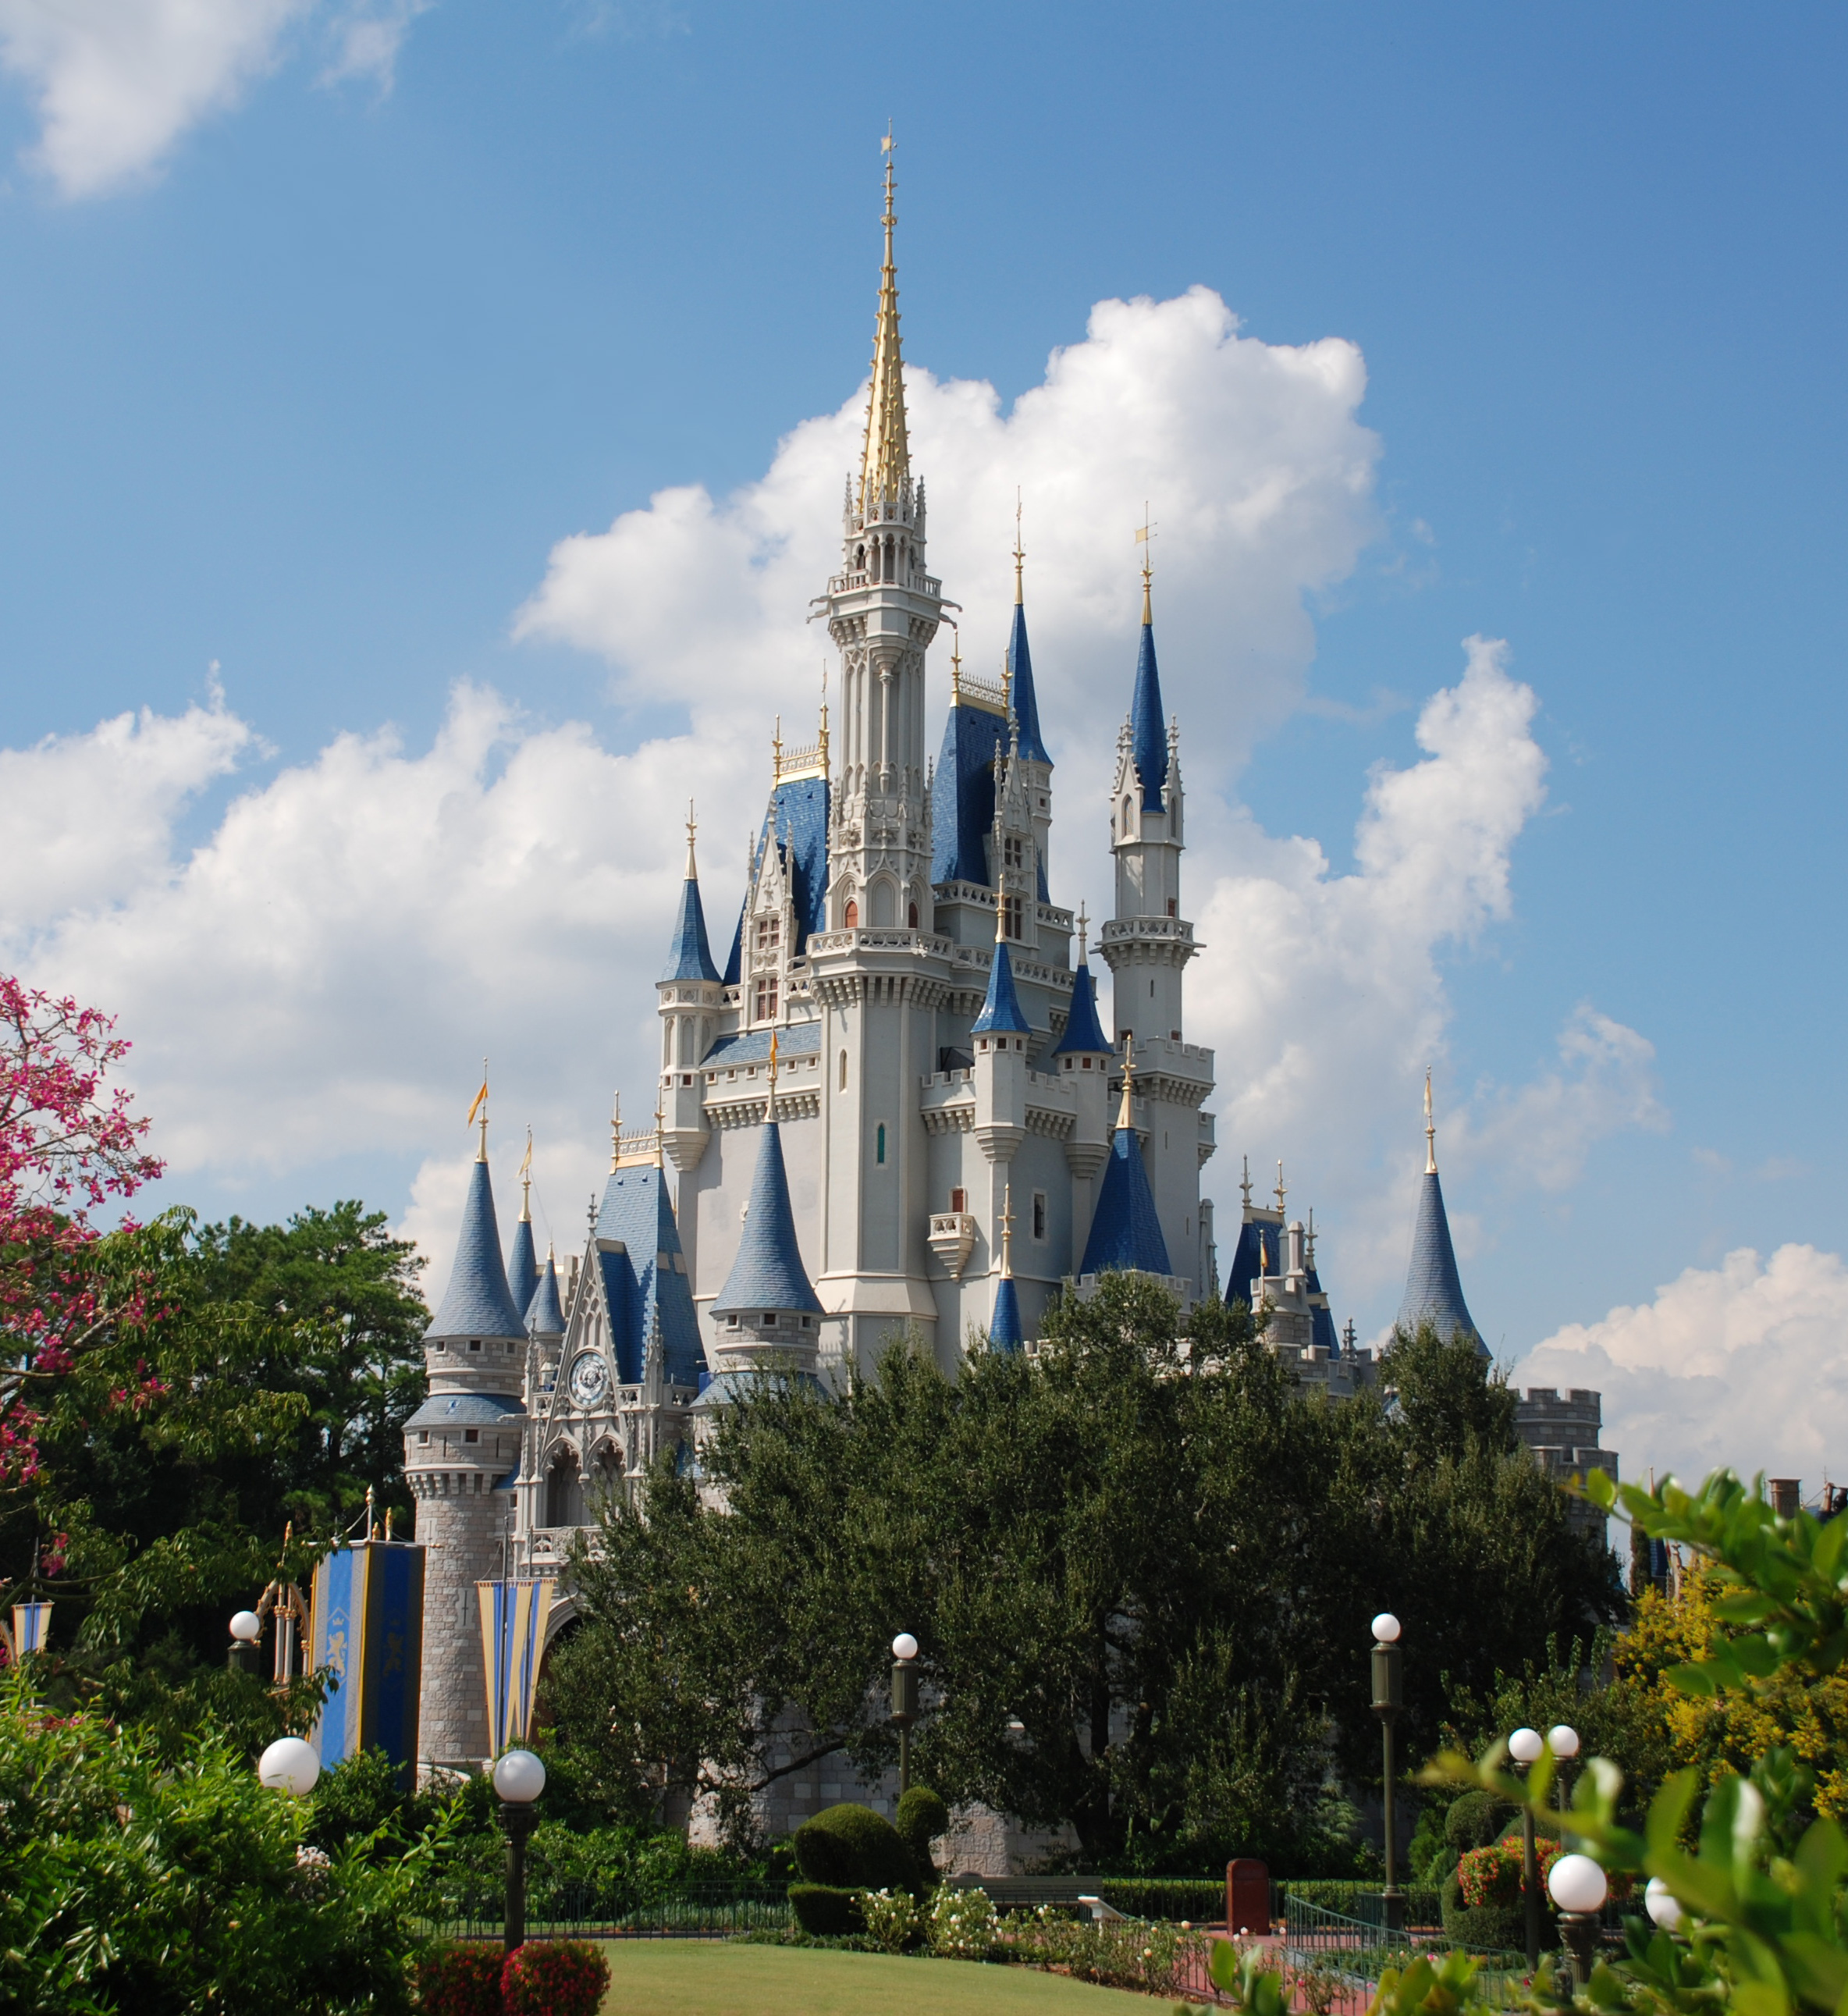 Cinderella Castle @ Florida Disneyland